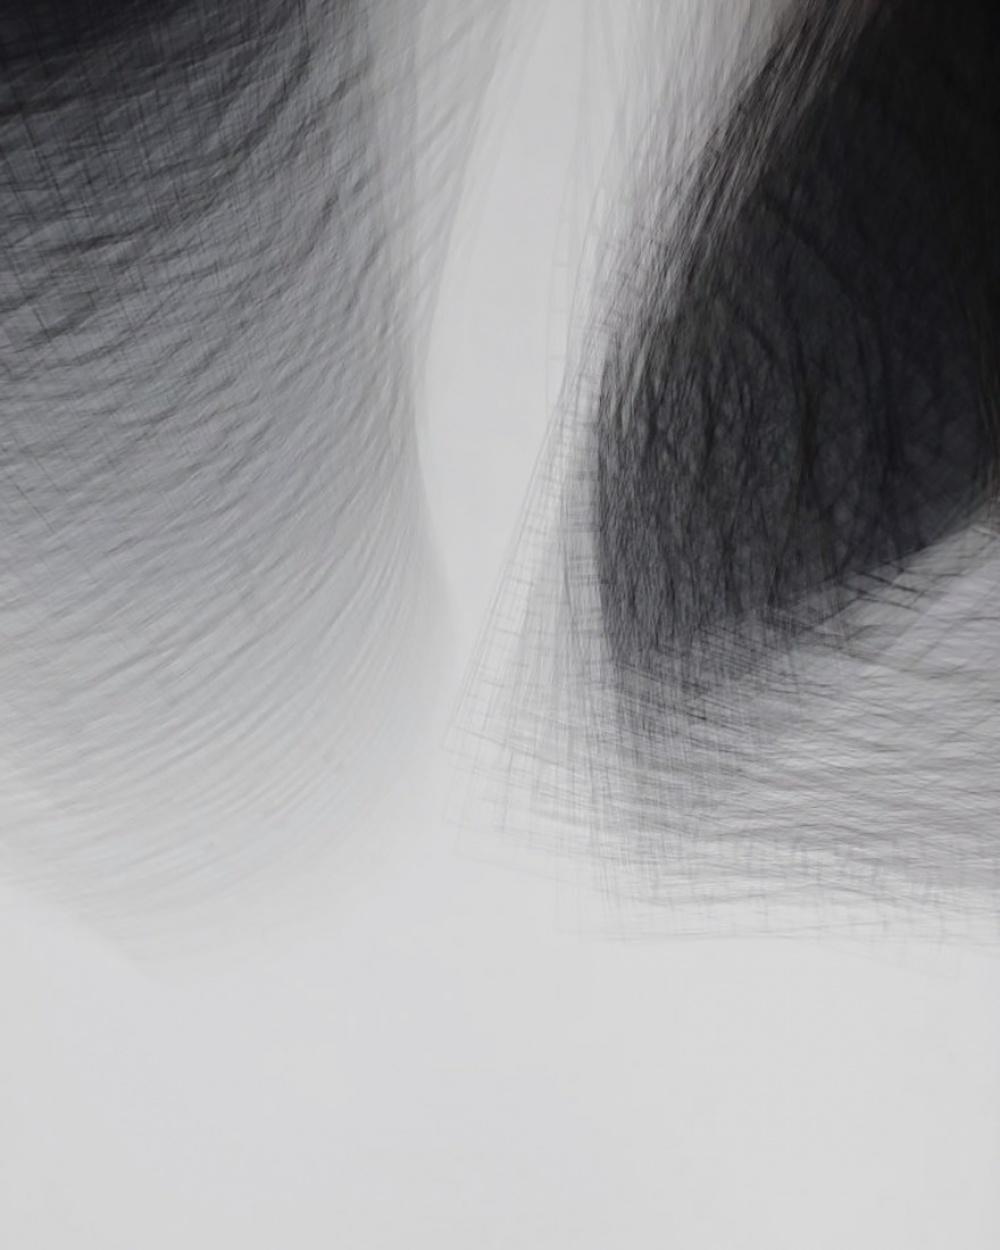 1-е место вноминации «Фотограф года»: Patryk Kuleta, Варшава, Польша Фото на превью: По мате